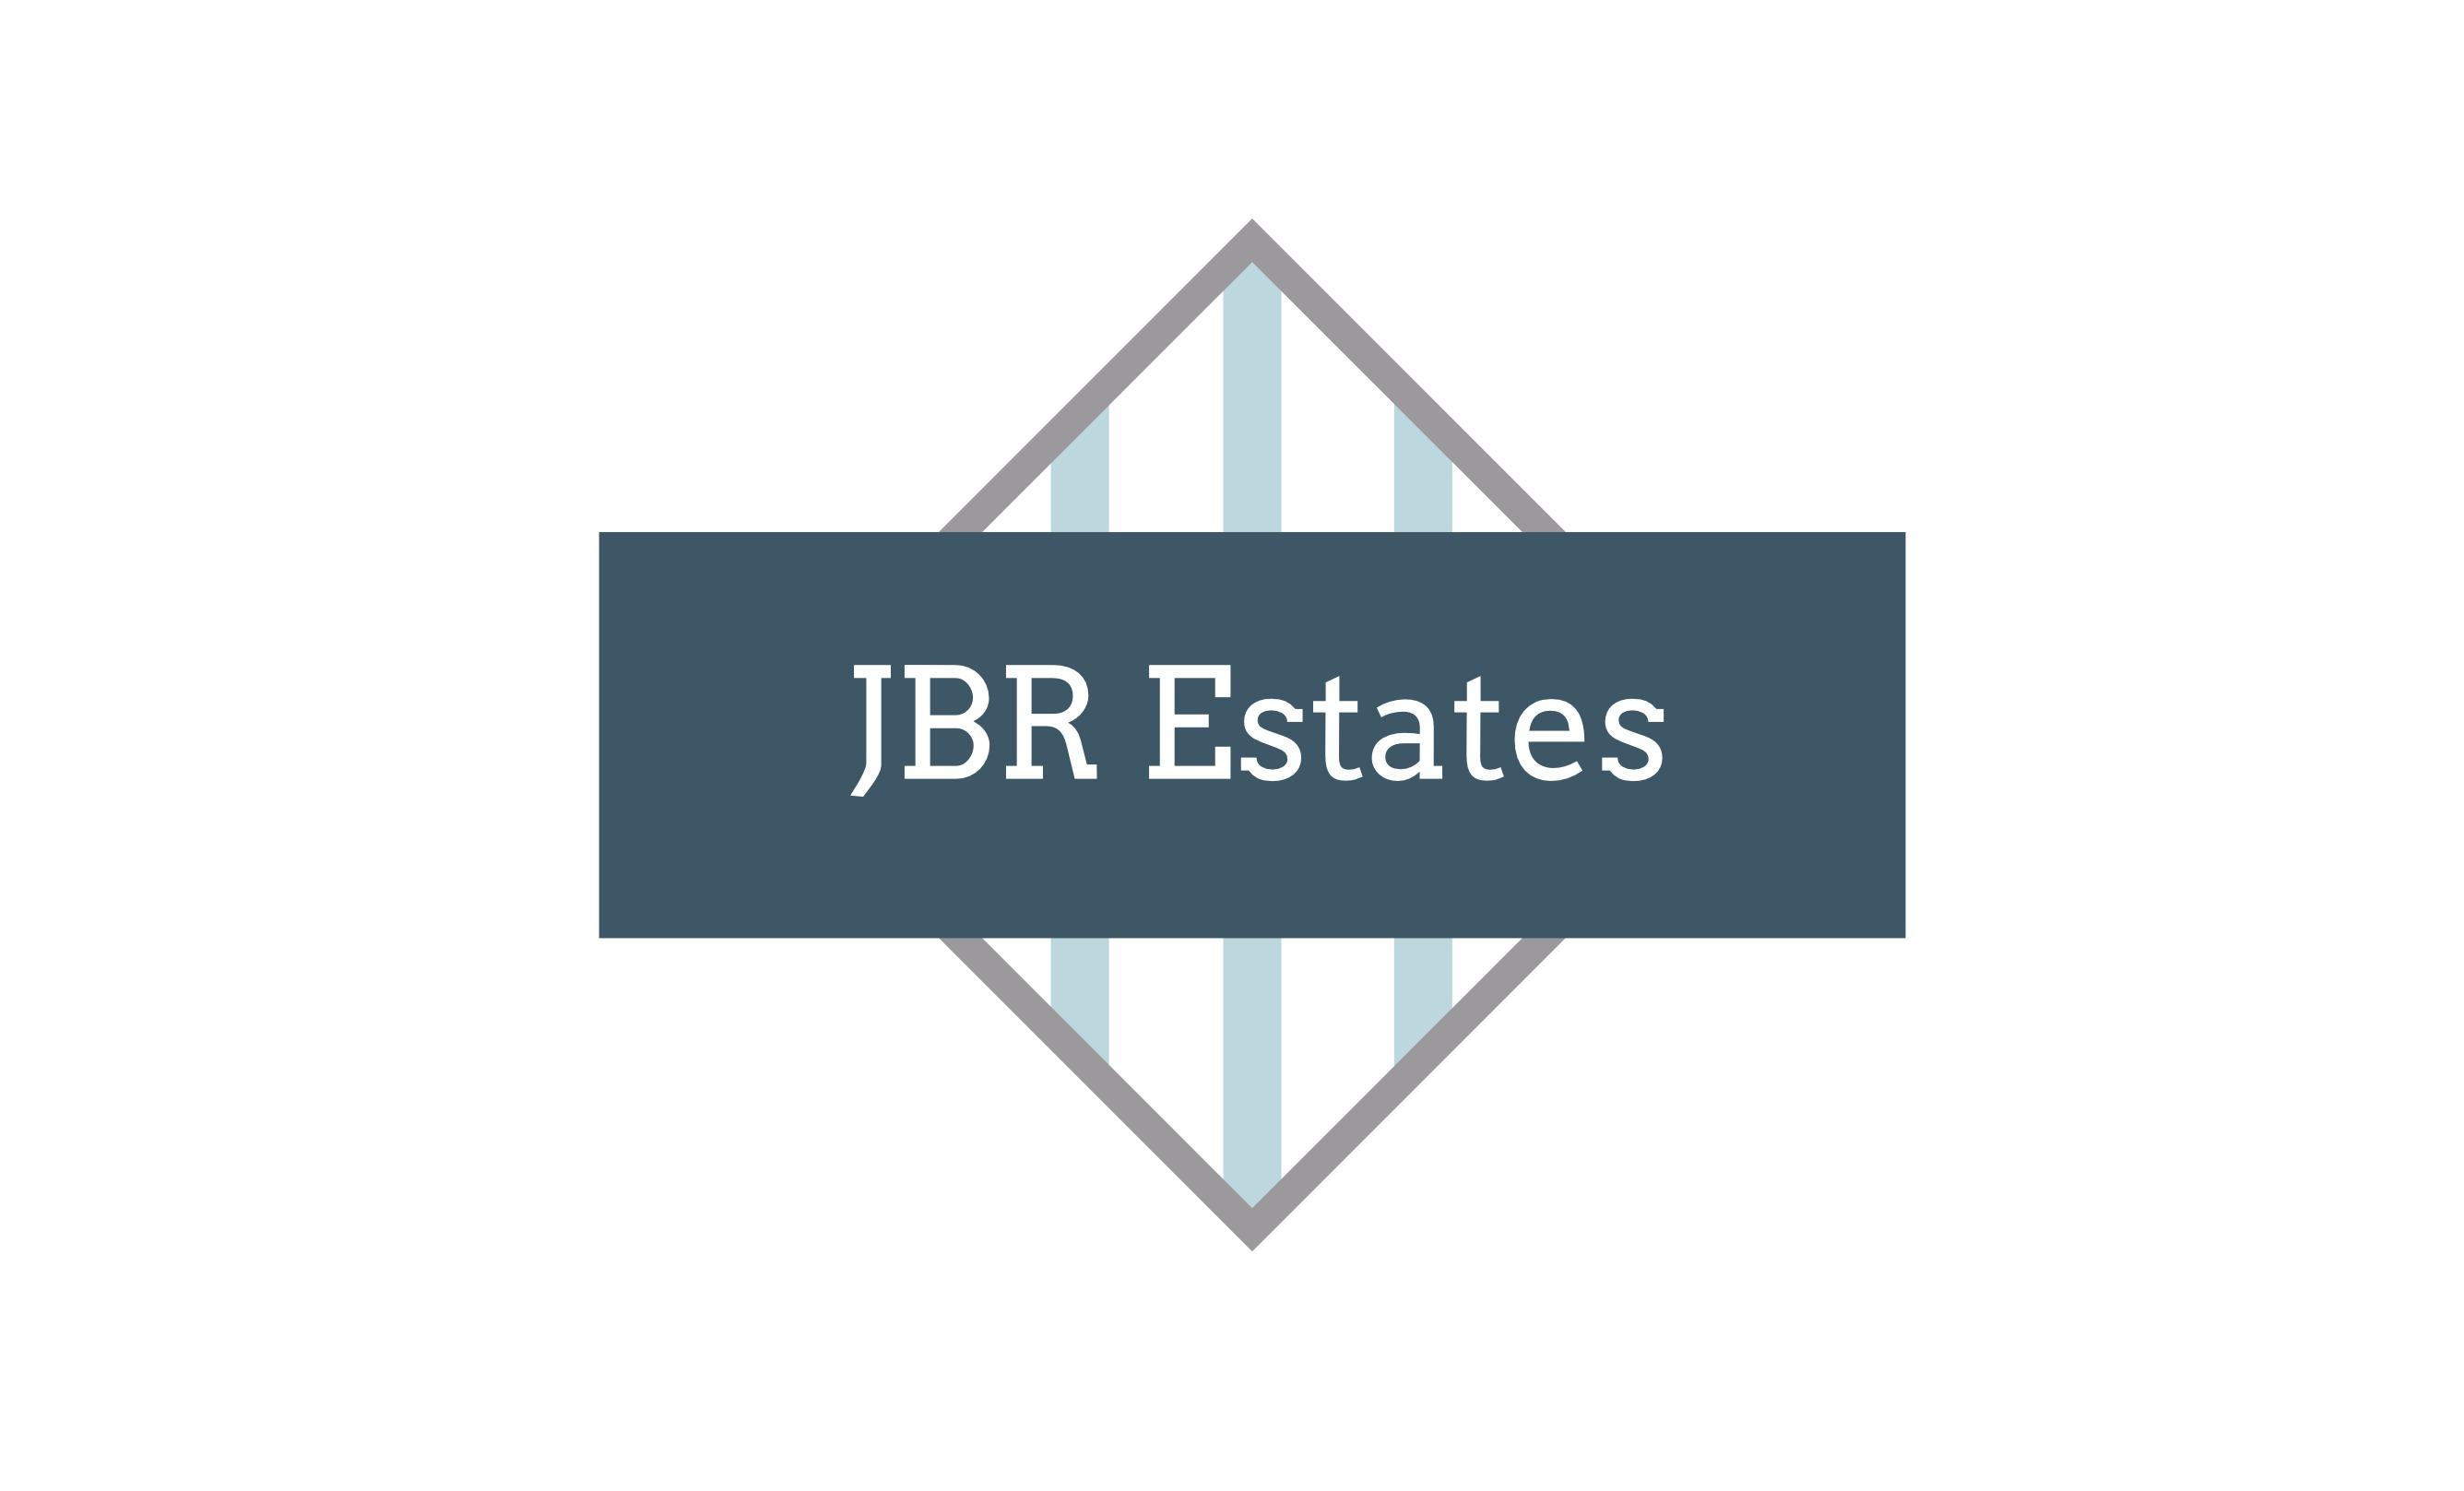 JBR Estates